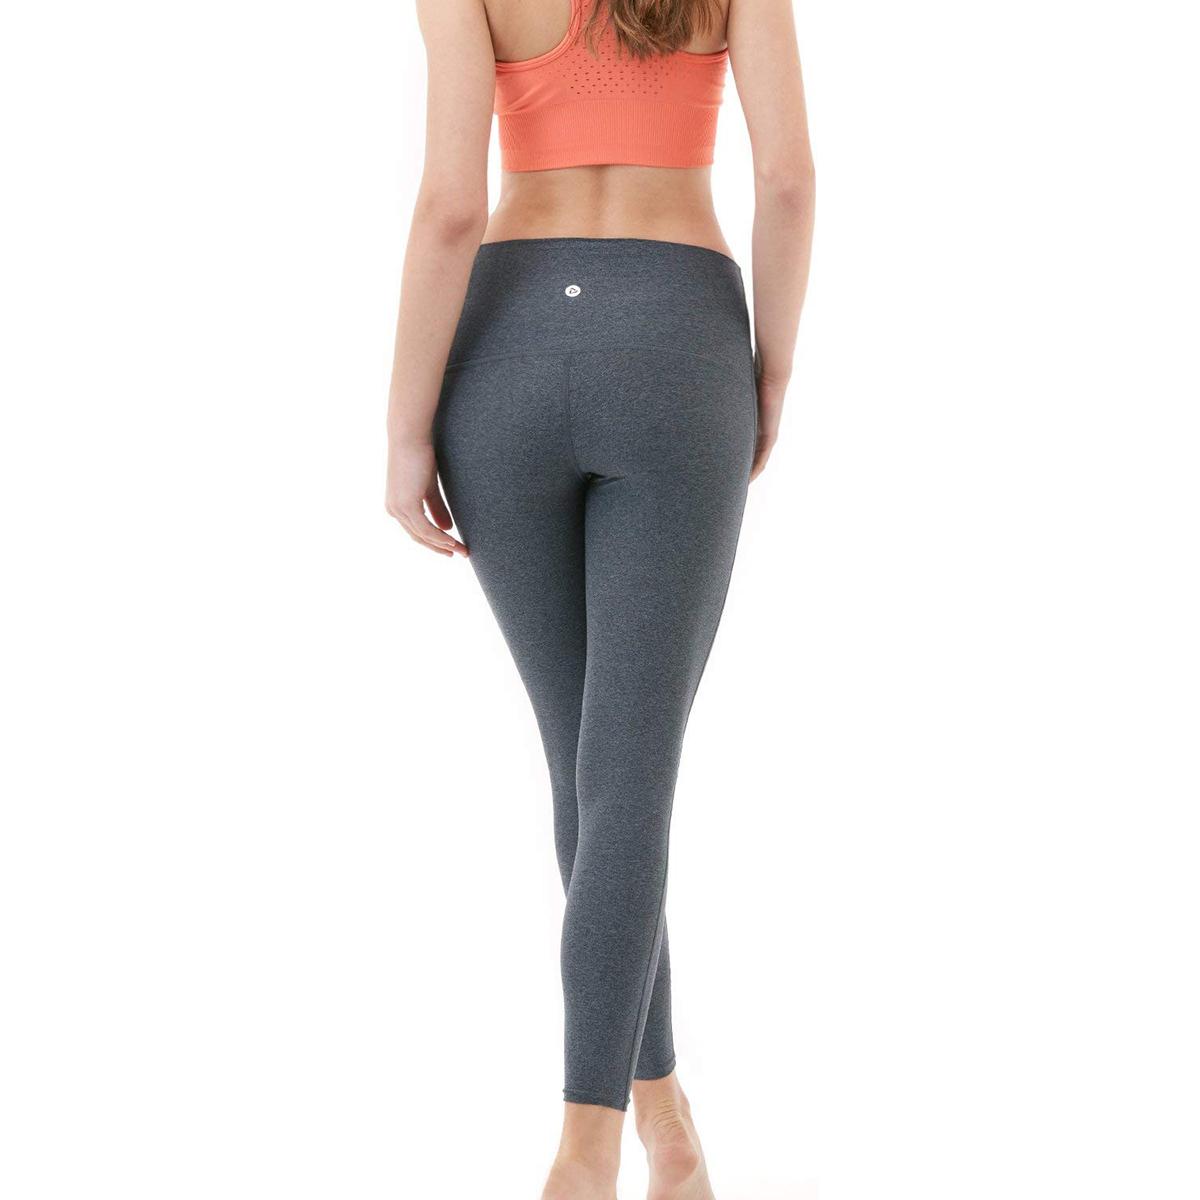 thumbnail 7 - TSLA Tesla FYP52 Women's High-Waisted Ultra-Stretch Tummy Control Yoga Pants